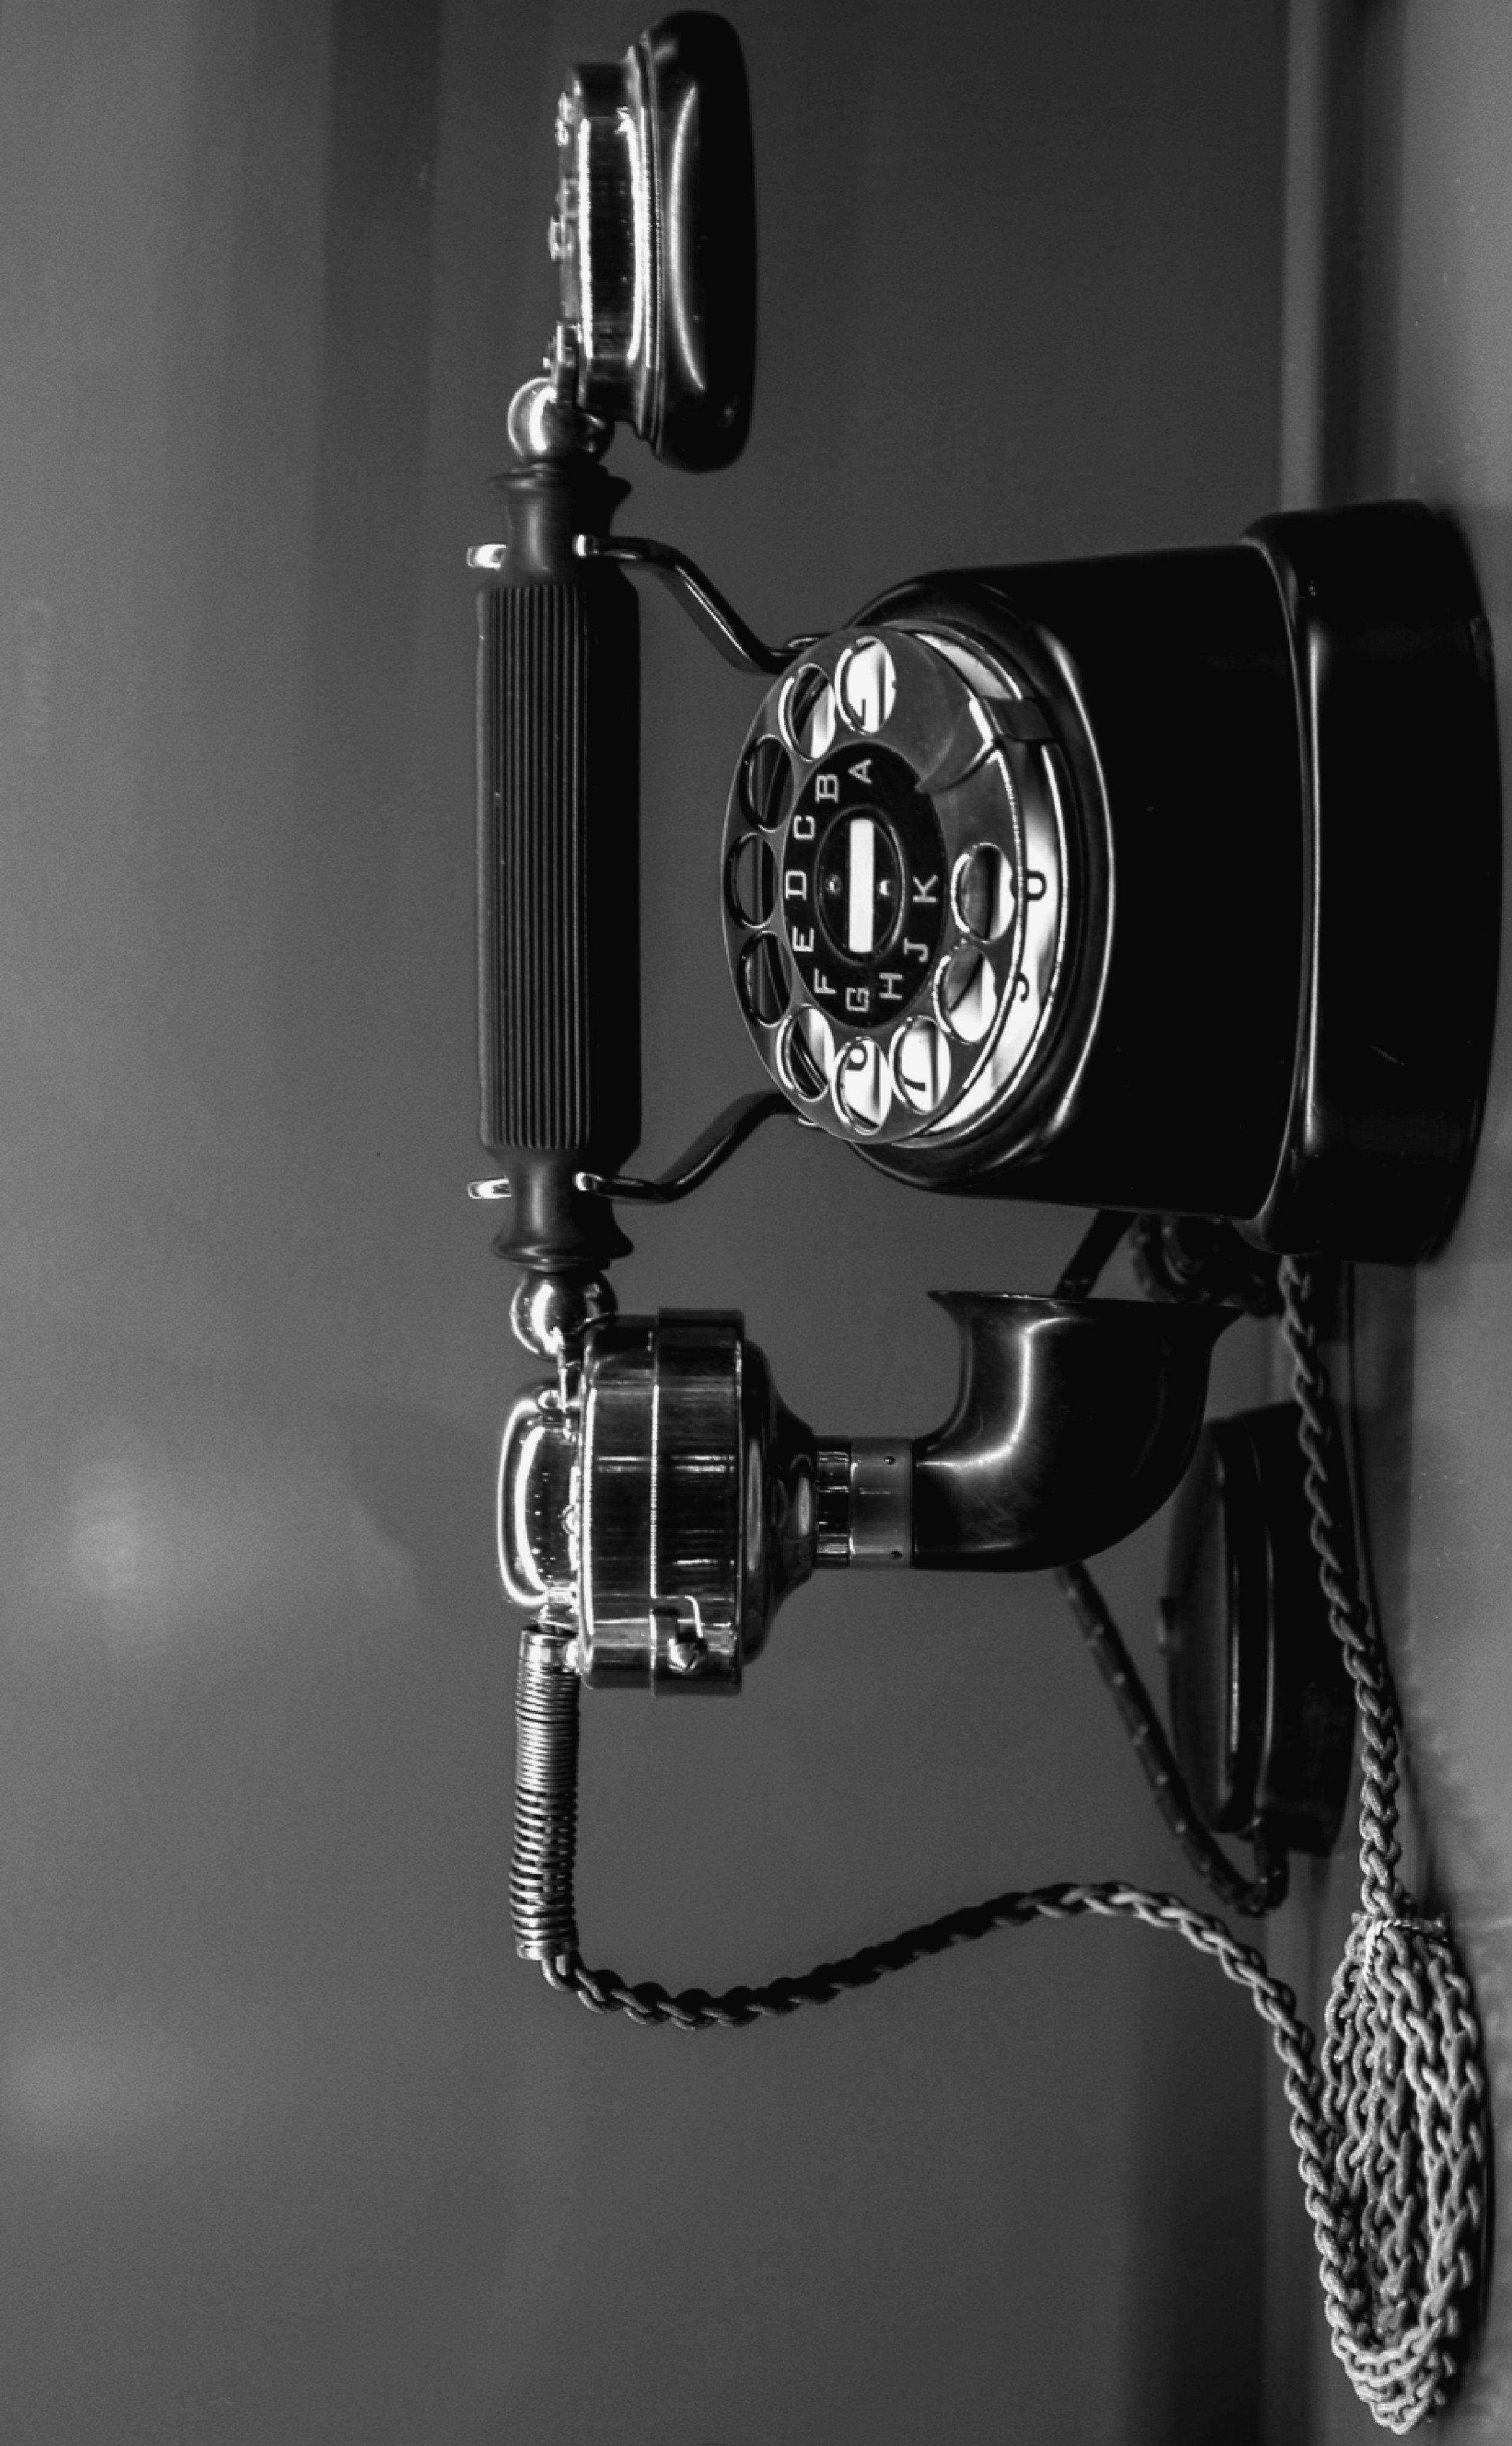 antique-communication-nostalgic-35886_Final.jpg